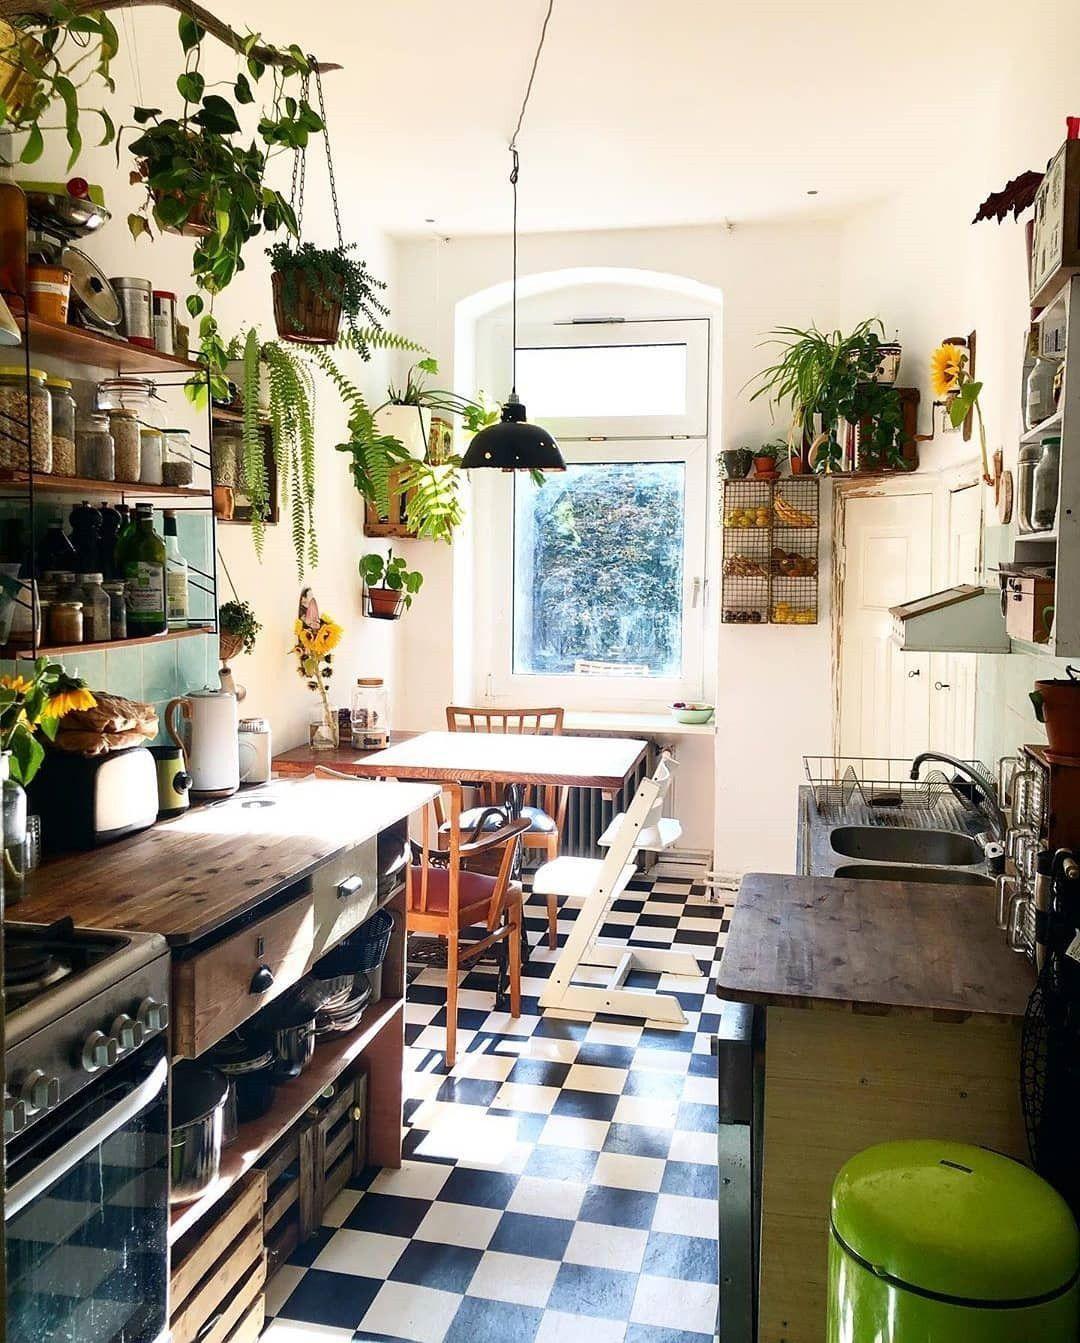 48++ Cheminee integree dans cuisine inspirations